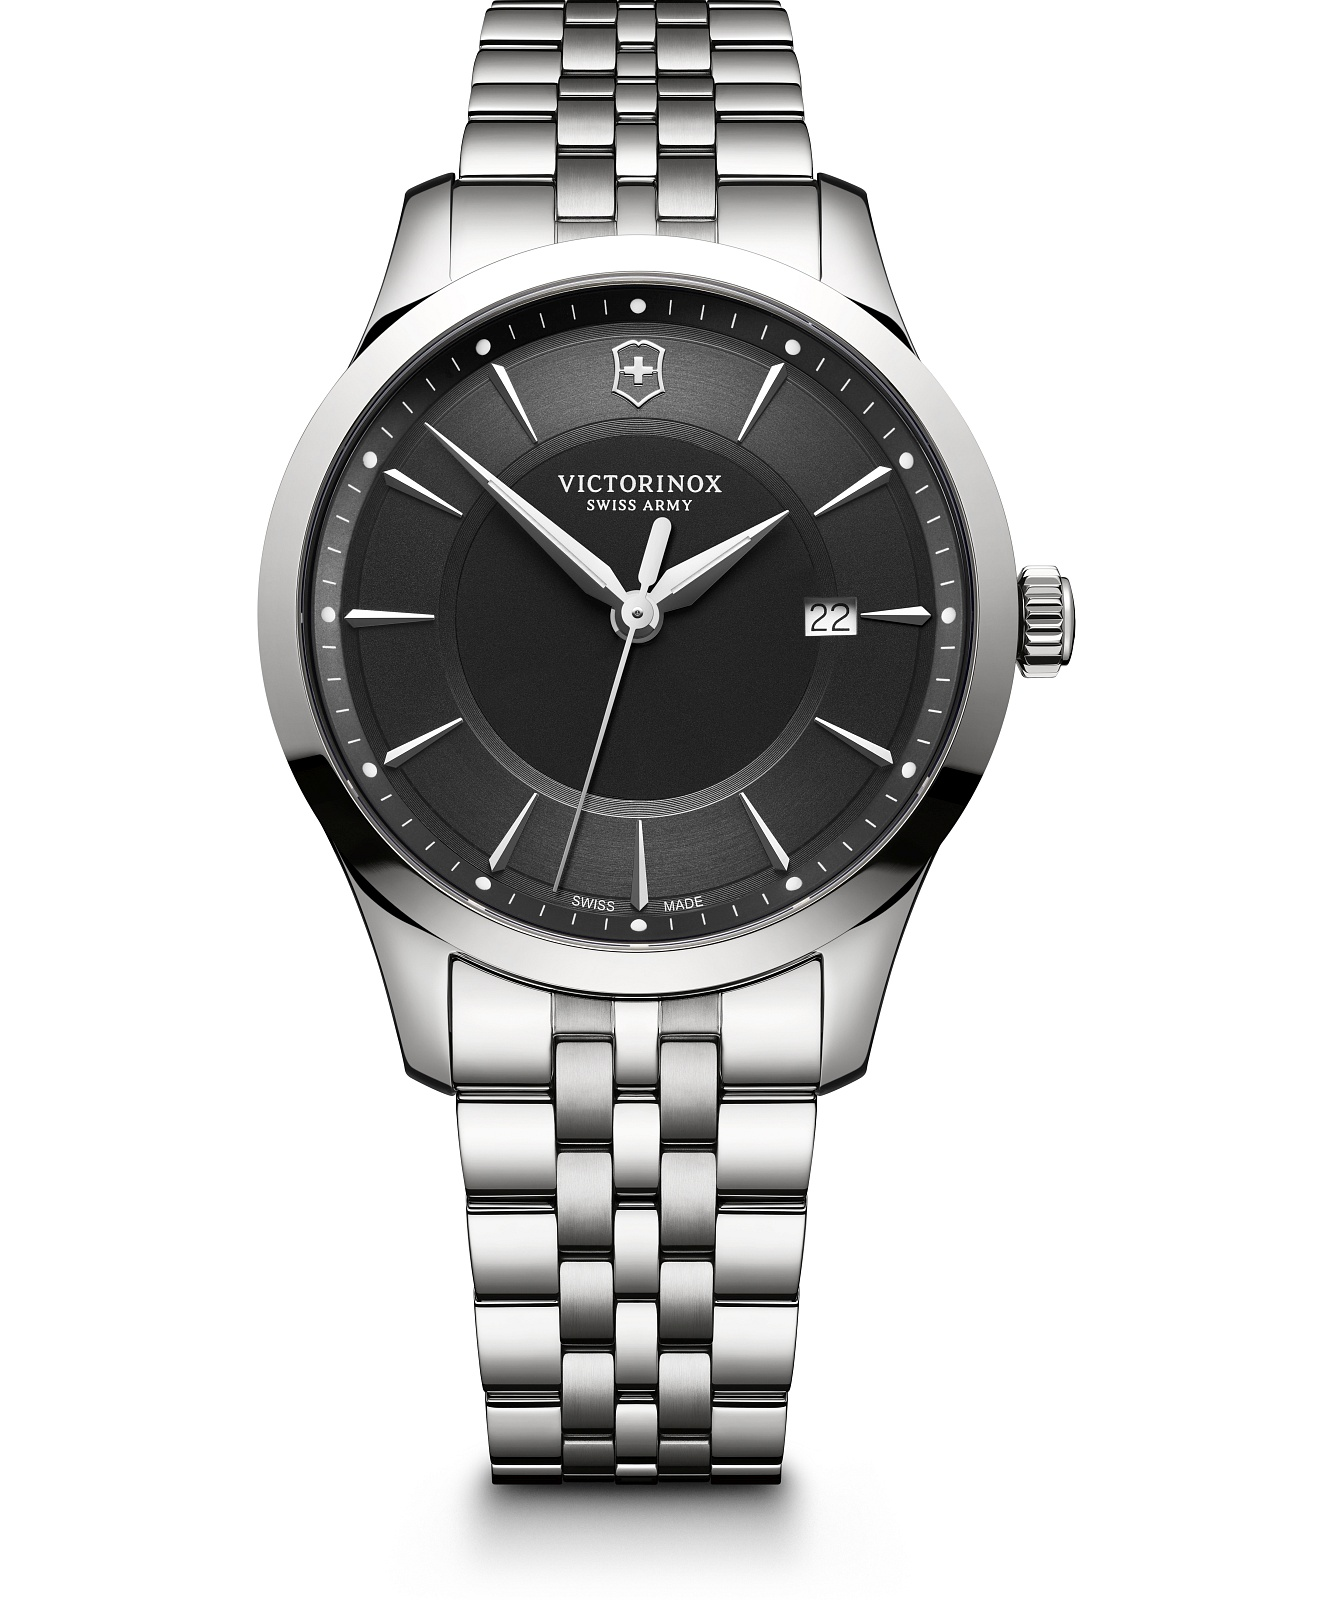 zegarek-meski-victorinox-alliance-gift-set-241801-1_002